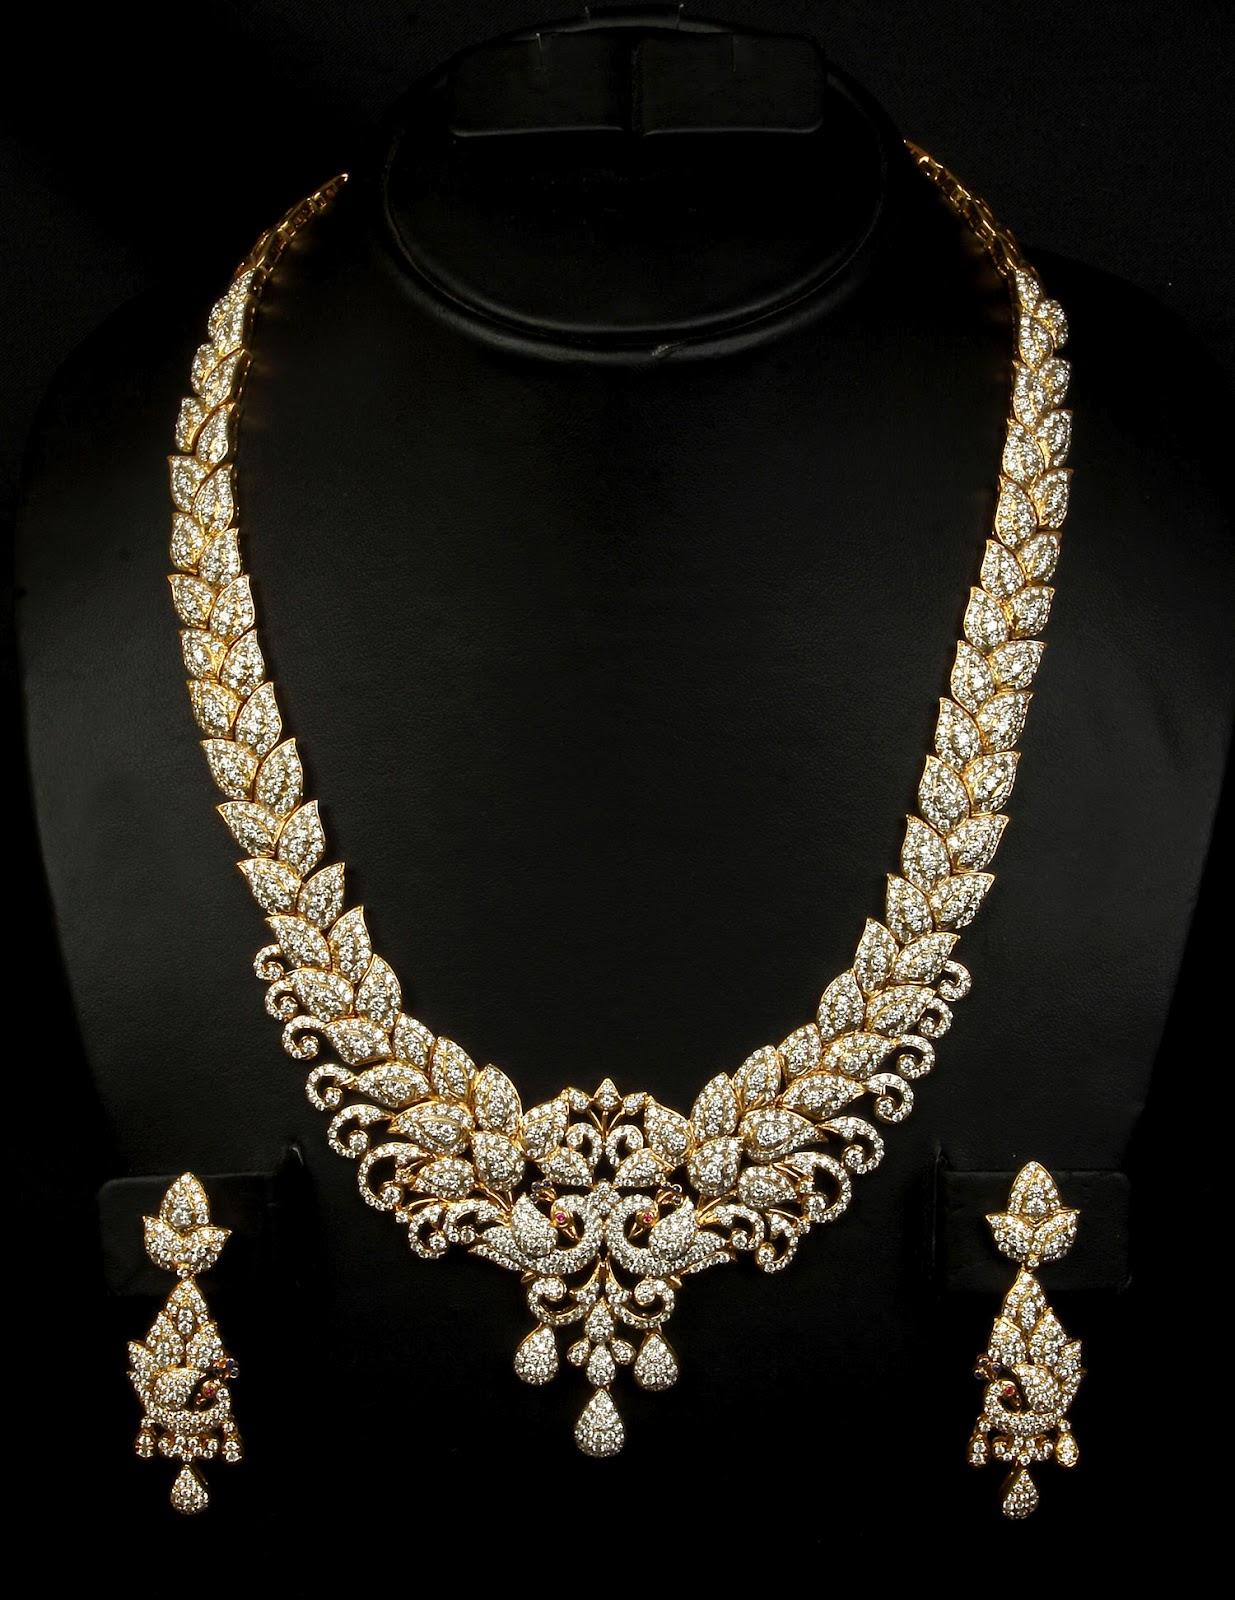 lATEST Diamond Necklace models